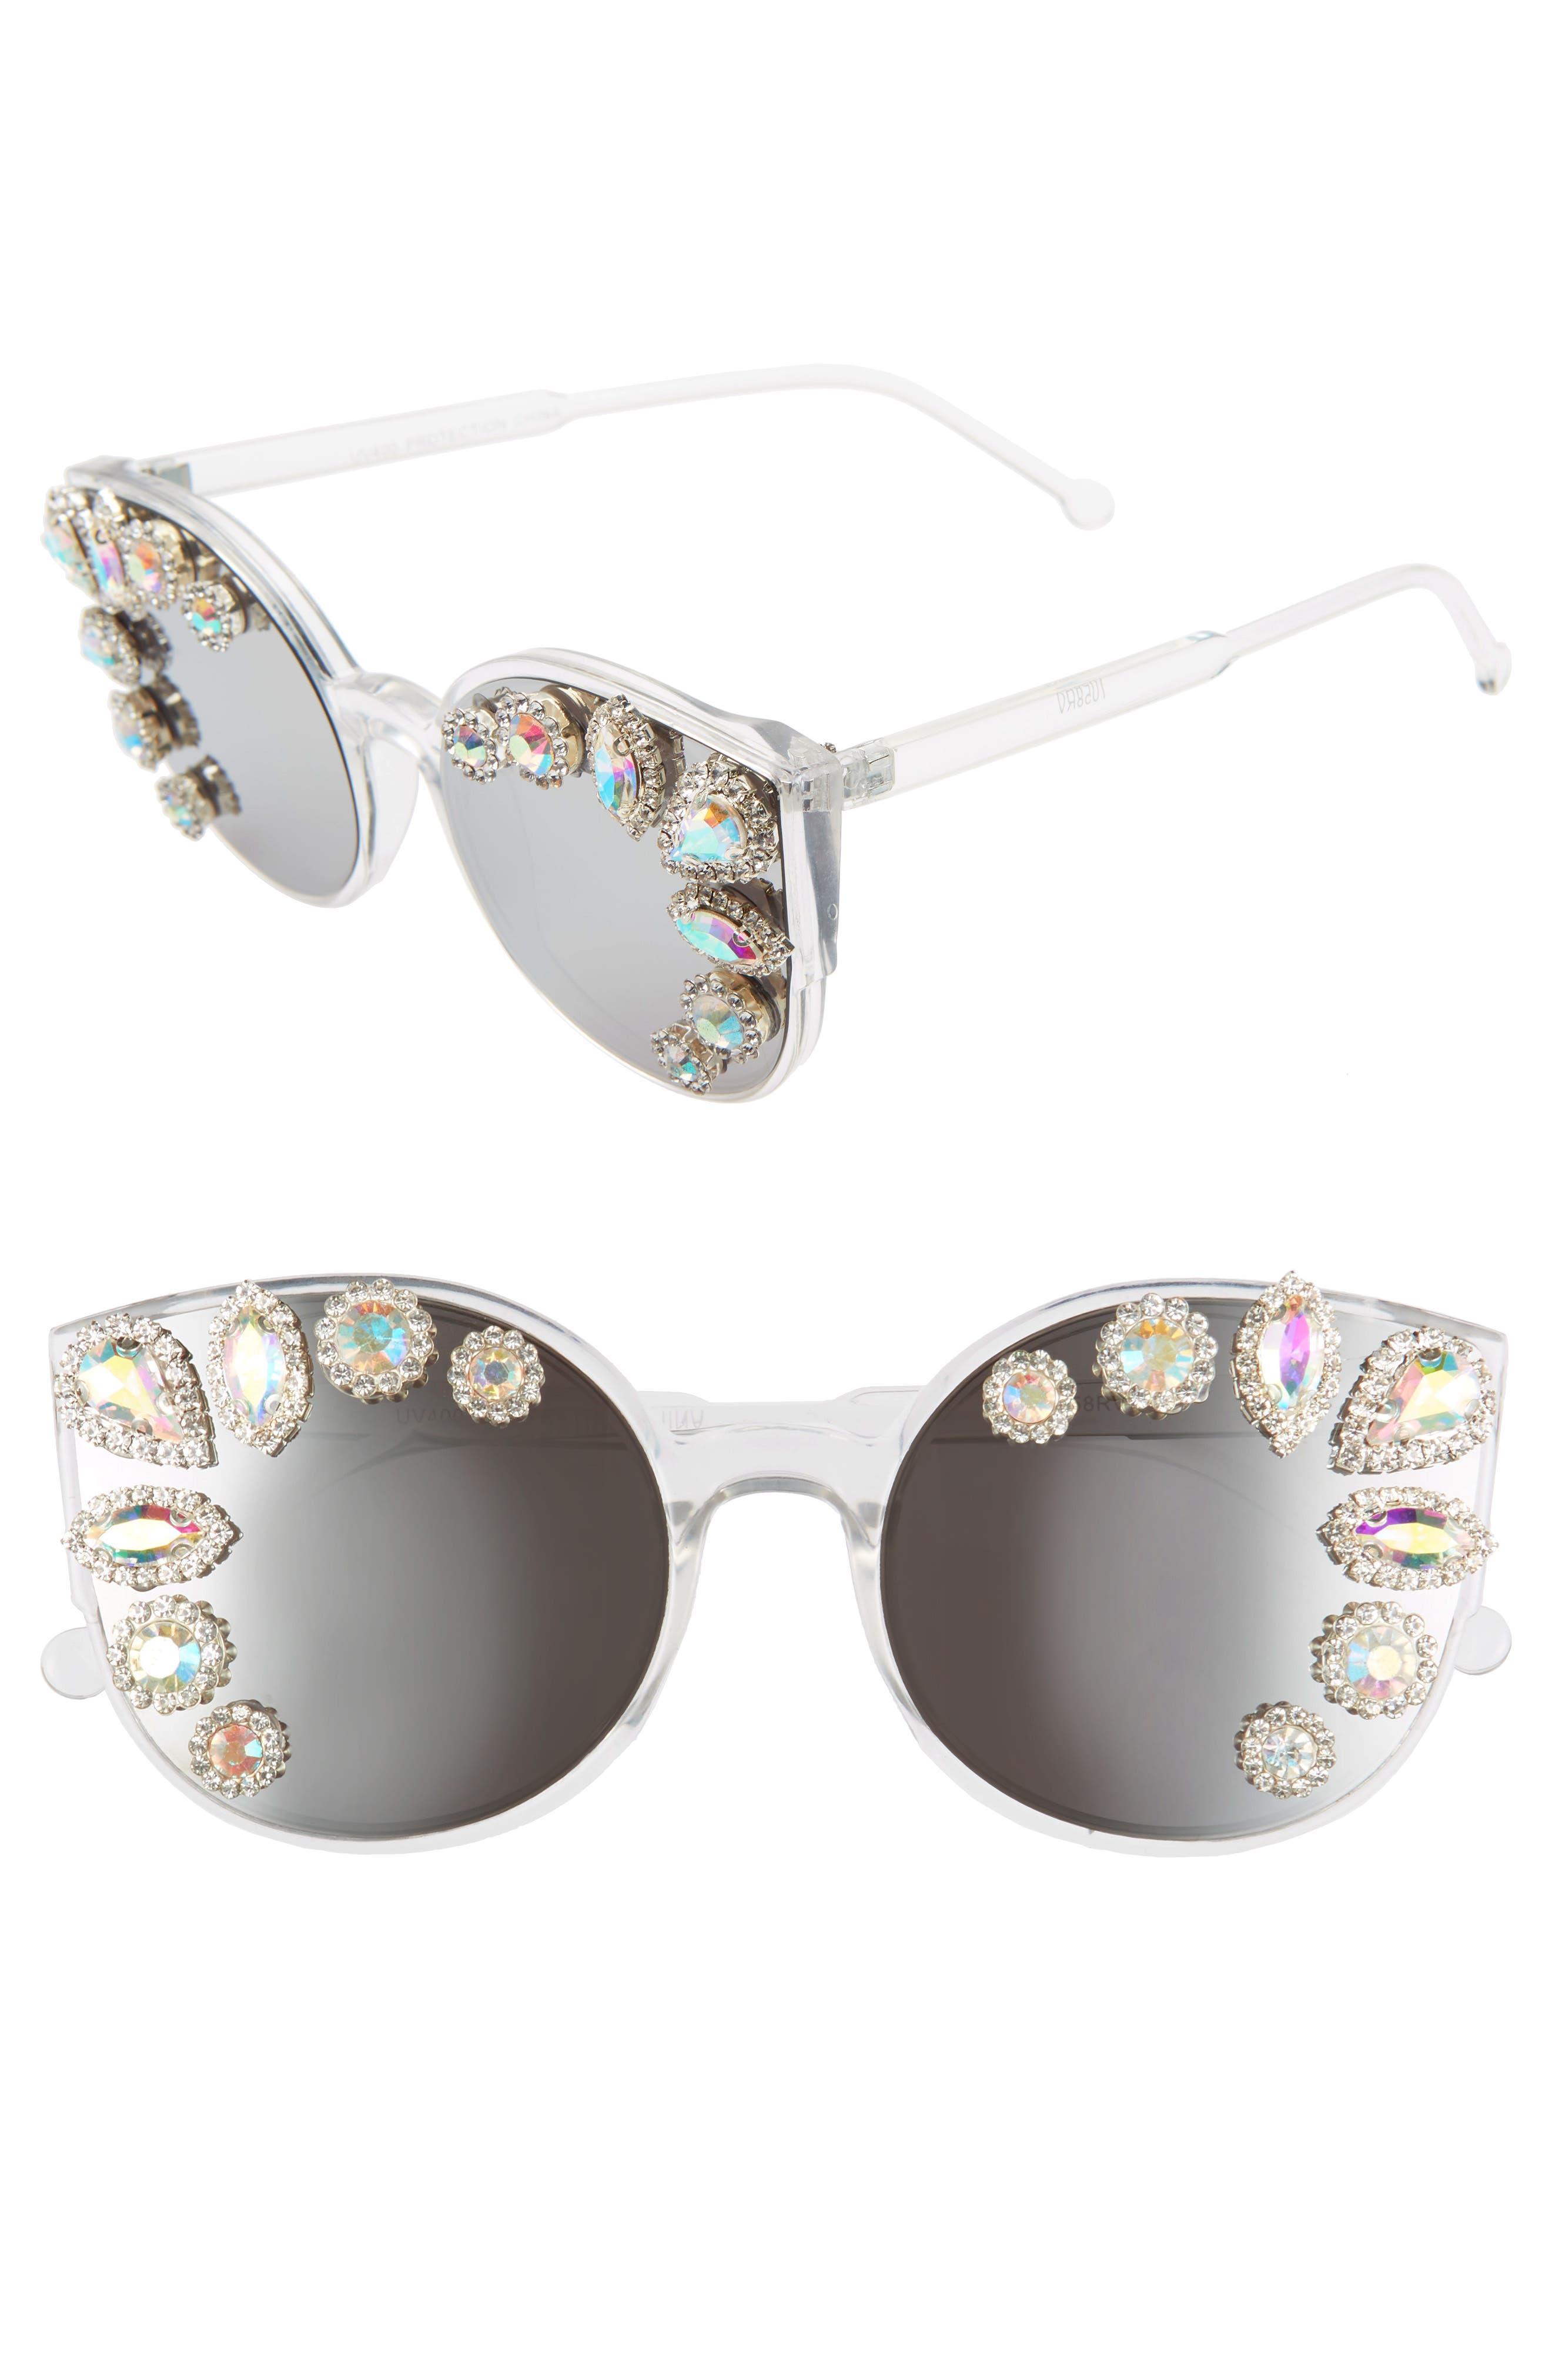 Rad + Refined Crystal Embellished Cat Eye Sunglasses - Silver/ Crystal